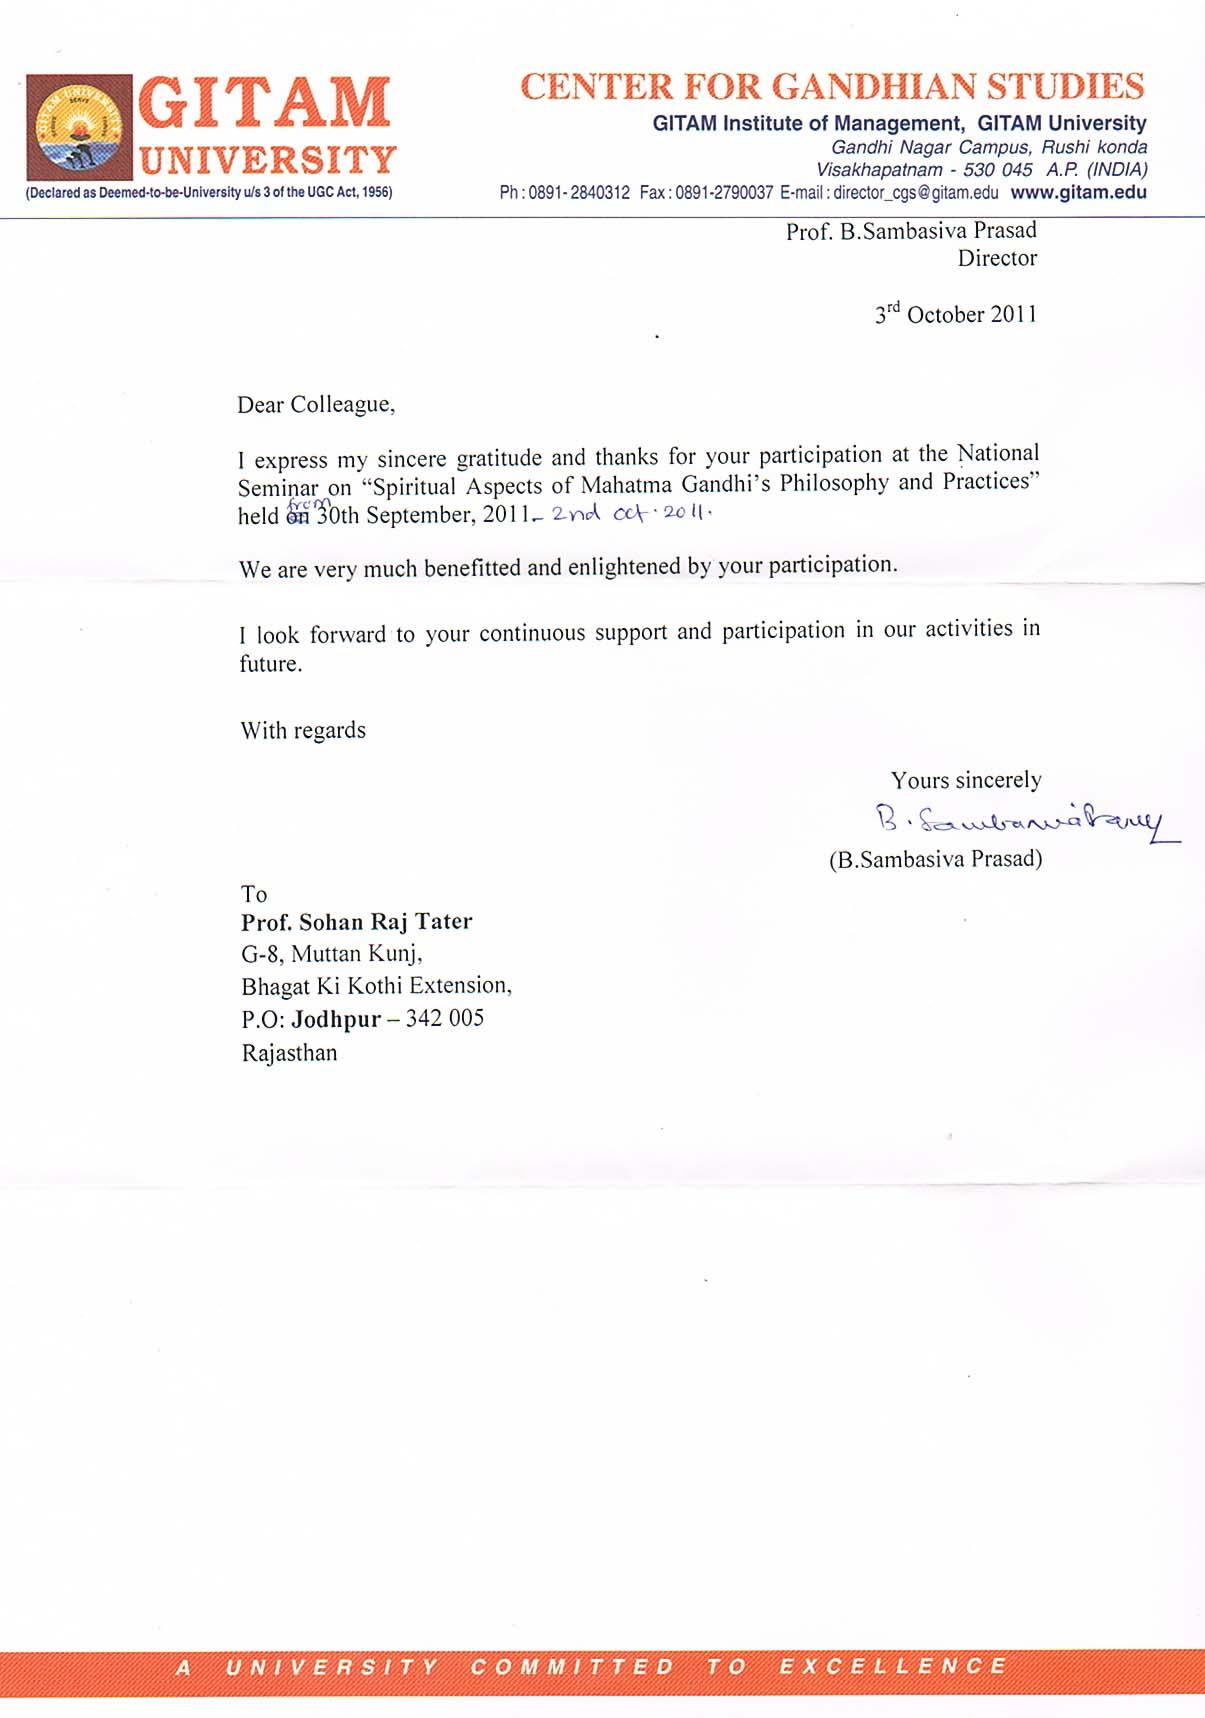 Profdr sohan raj tater e knowledge museum gitam seminar certificate click here stopboris Image collections